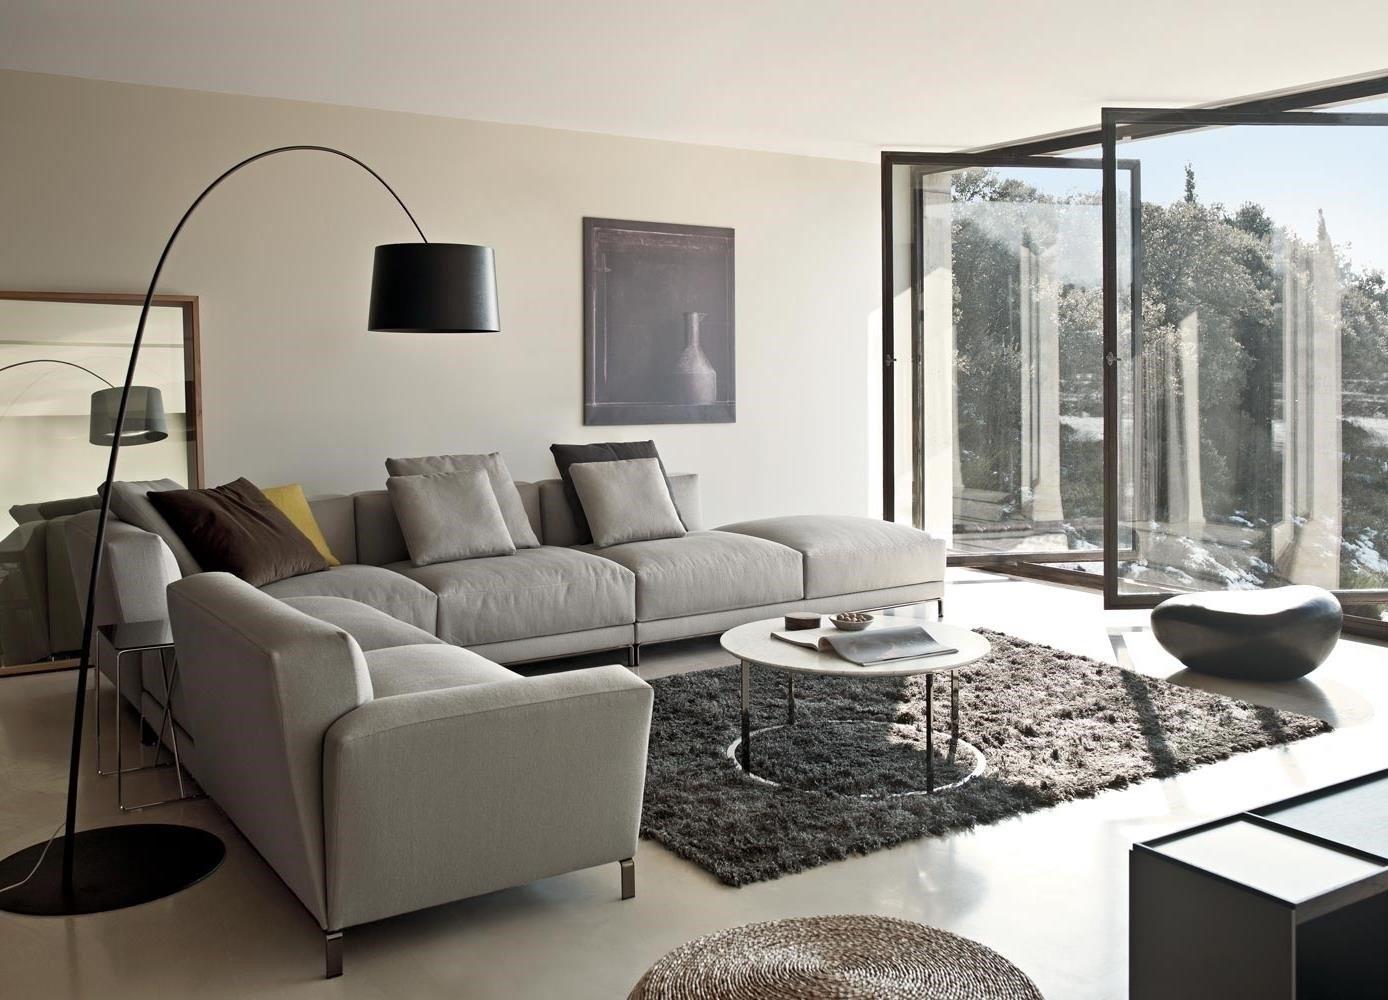 Incredible Condo Sectional Sofa – Mediasupload Inside Sectional Sofas For Condos (Image 6 of 10)